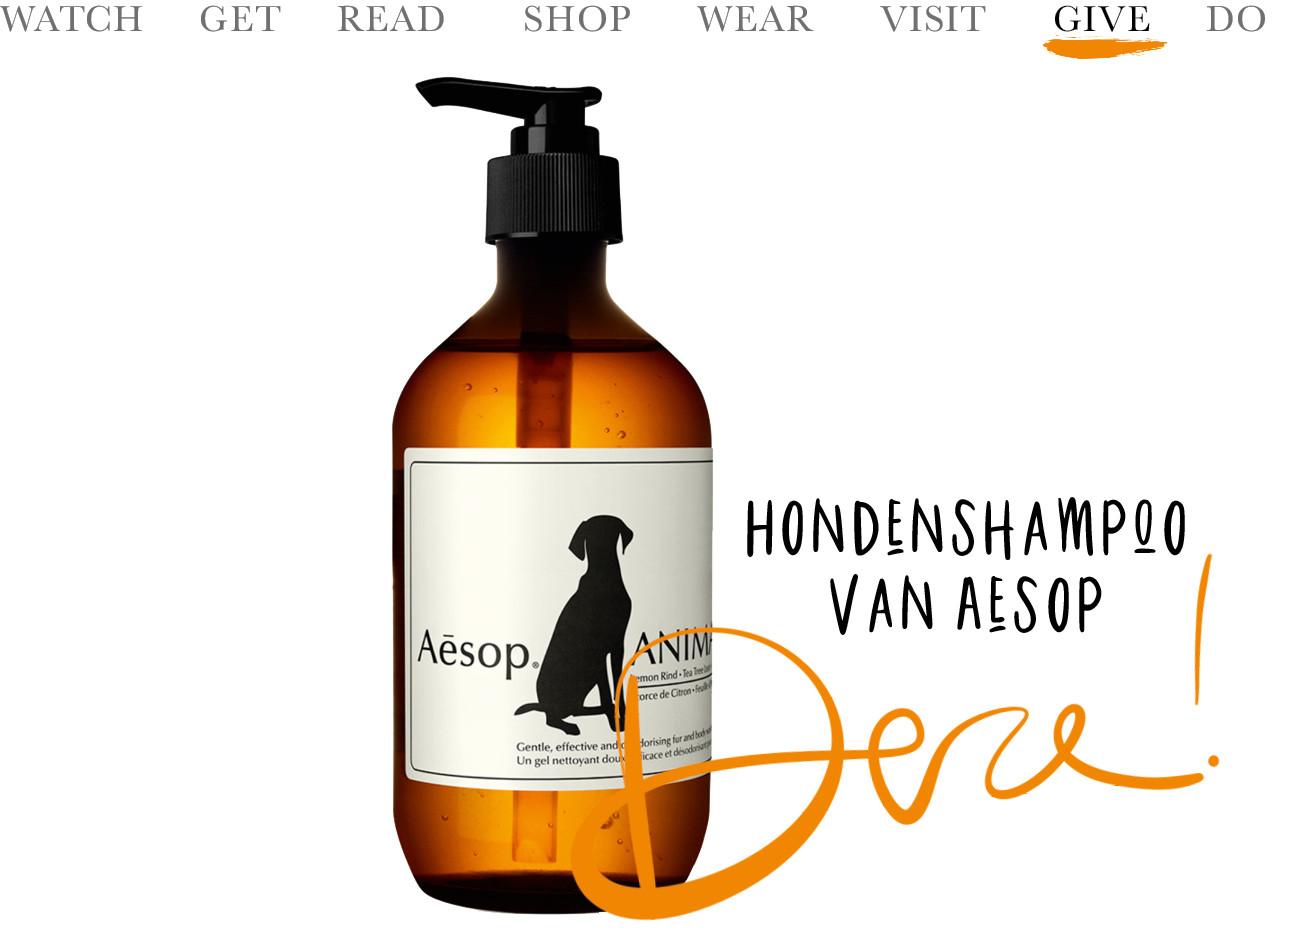 De aseop honden shampoo